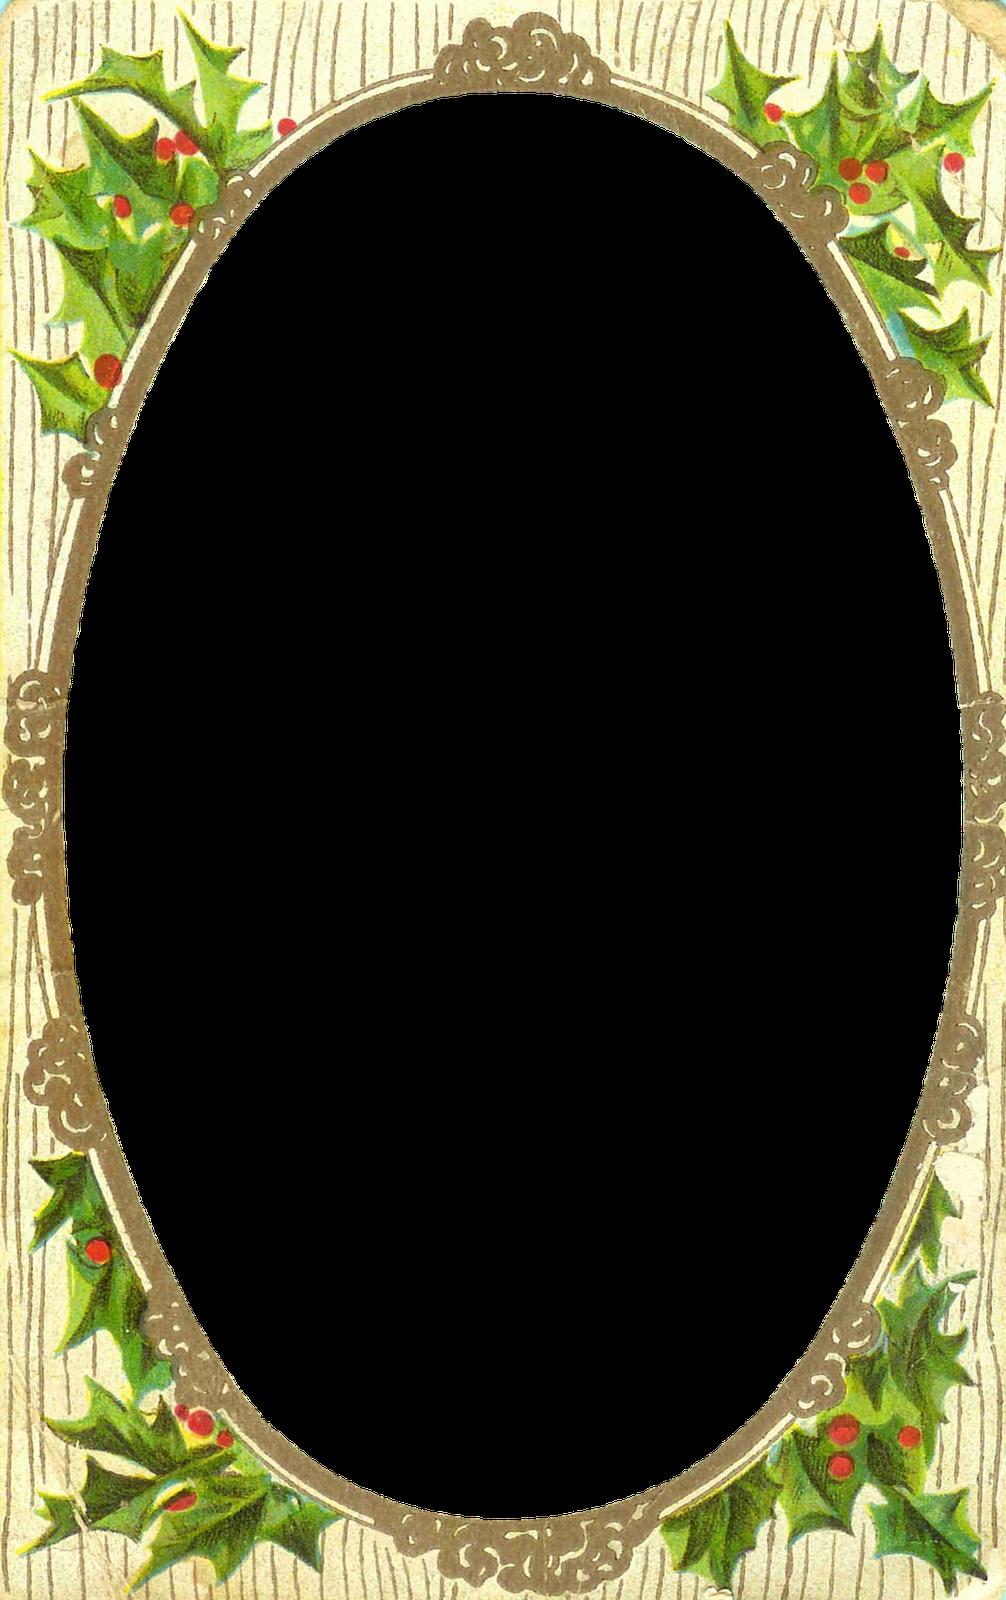 5 Images of Free Printable Christmas Tag Frames